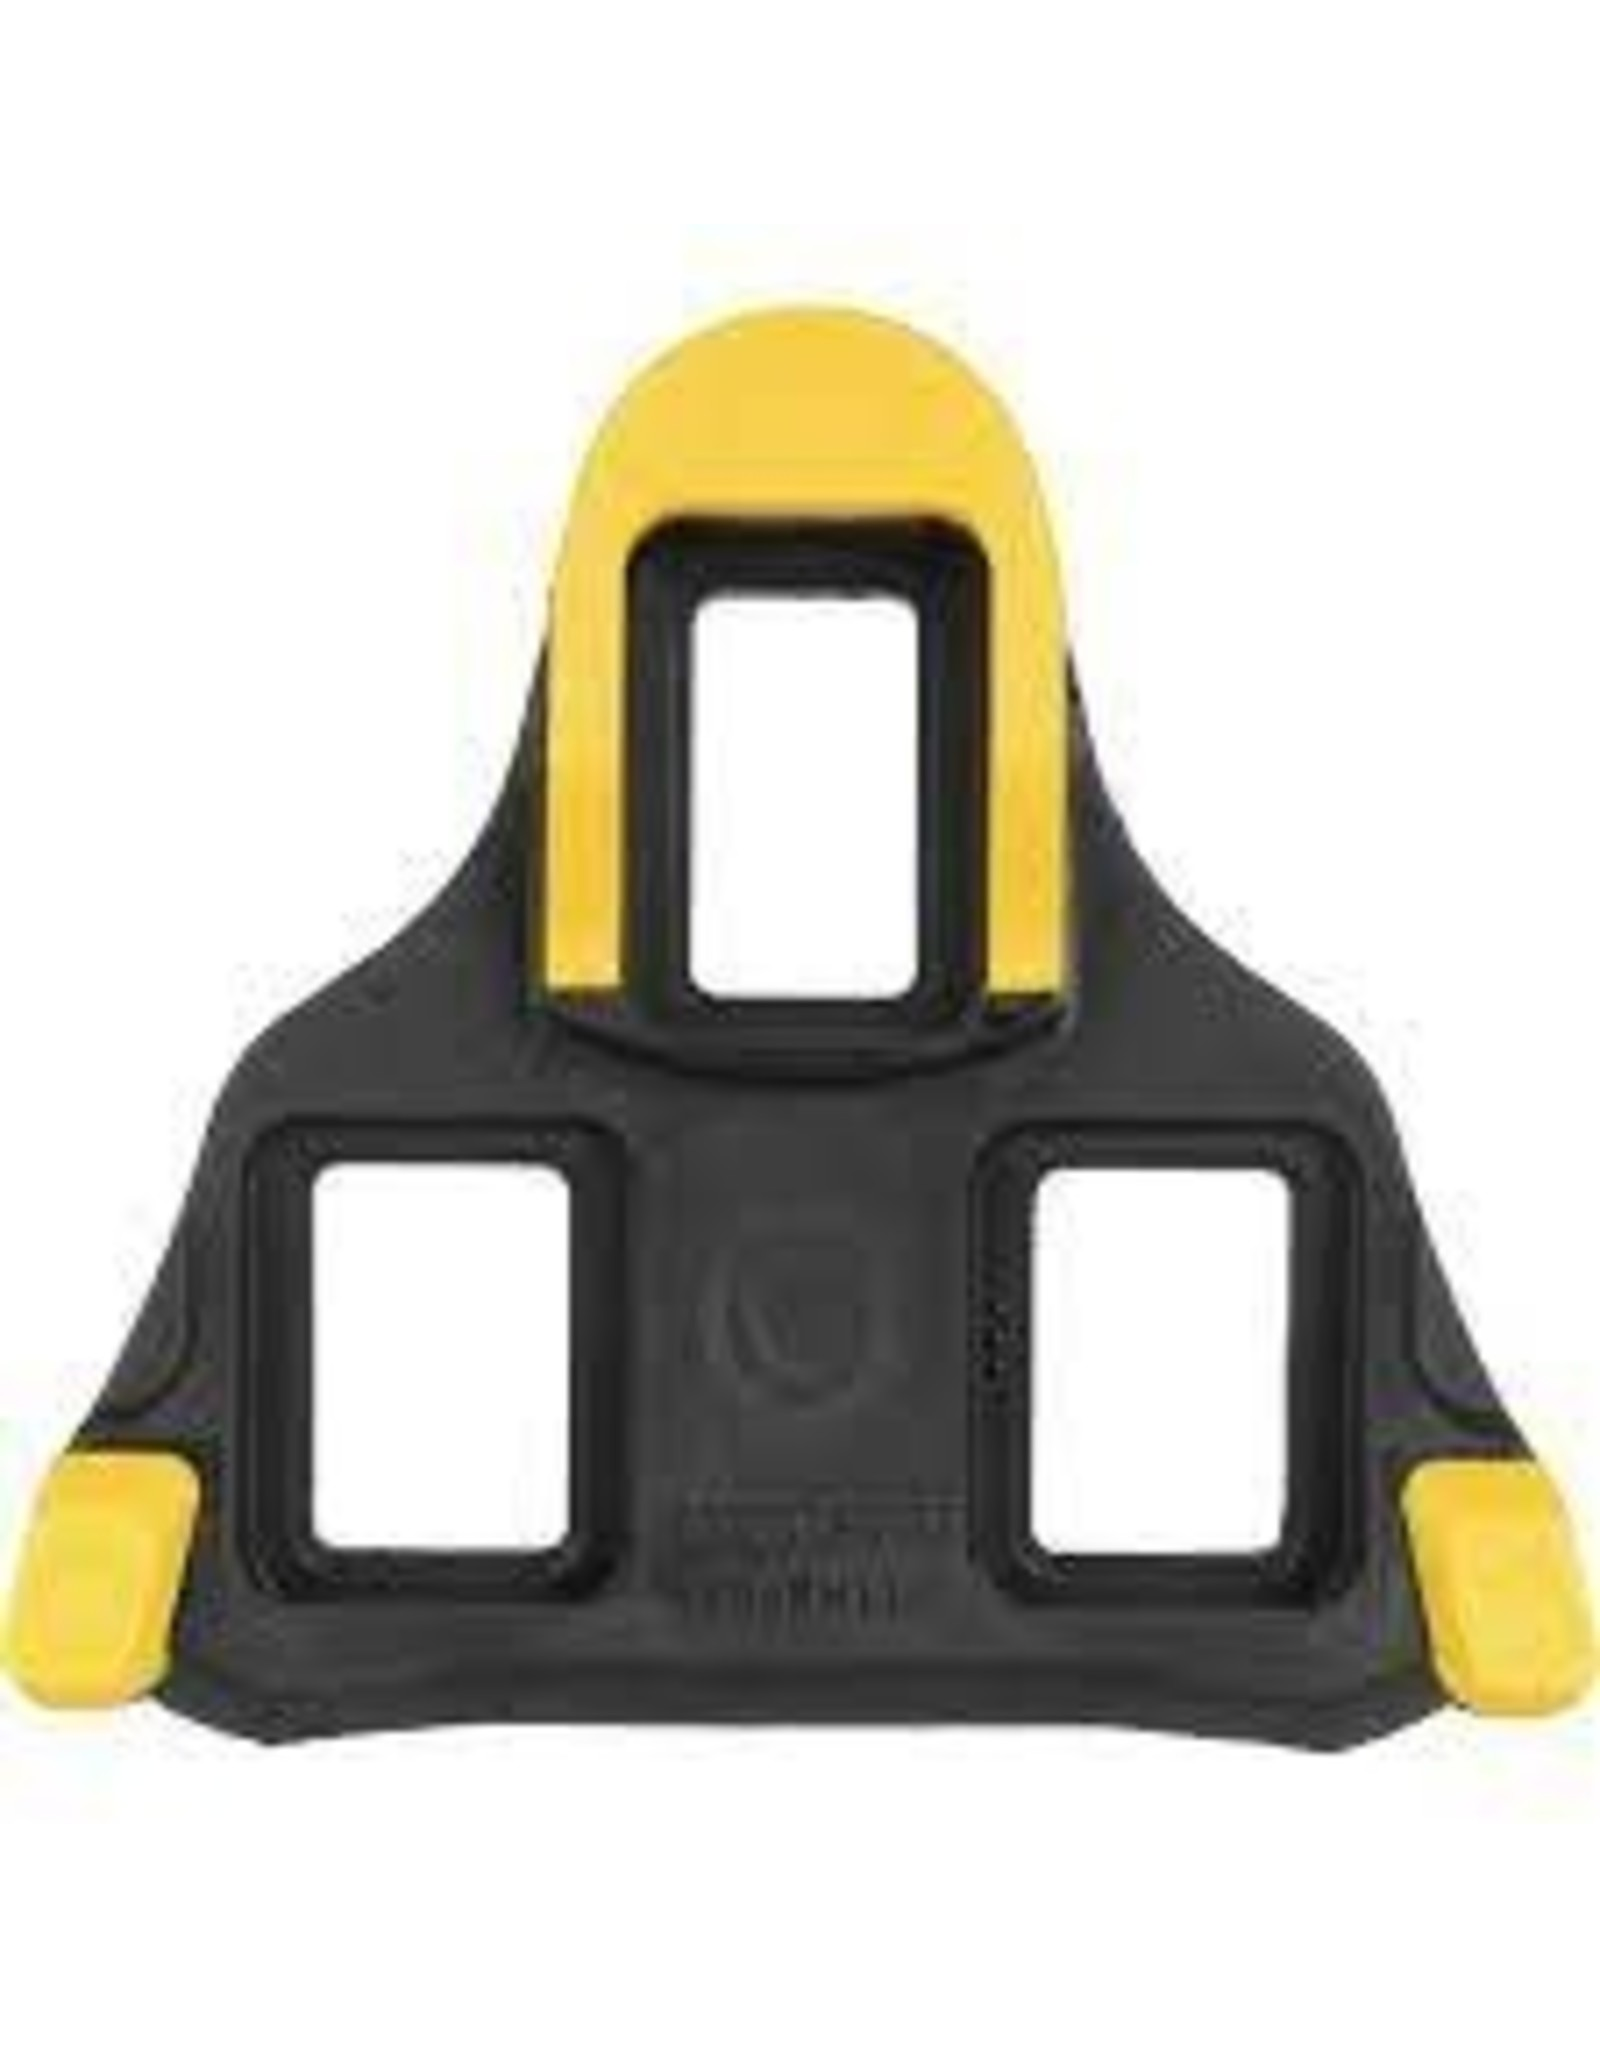 Giant Cleat 6 Deg Shim SPD-SL Compatible Blk/Yellow